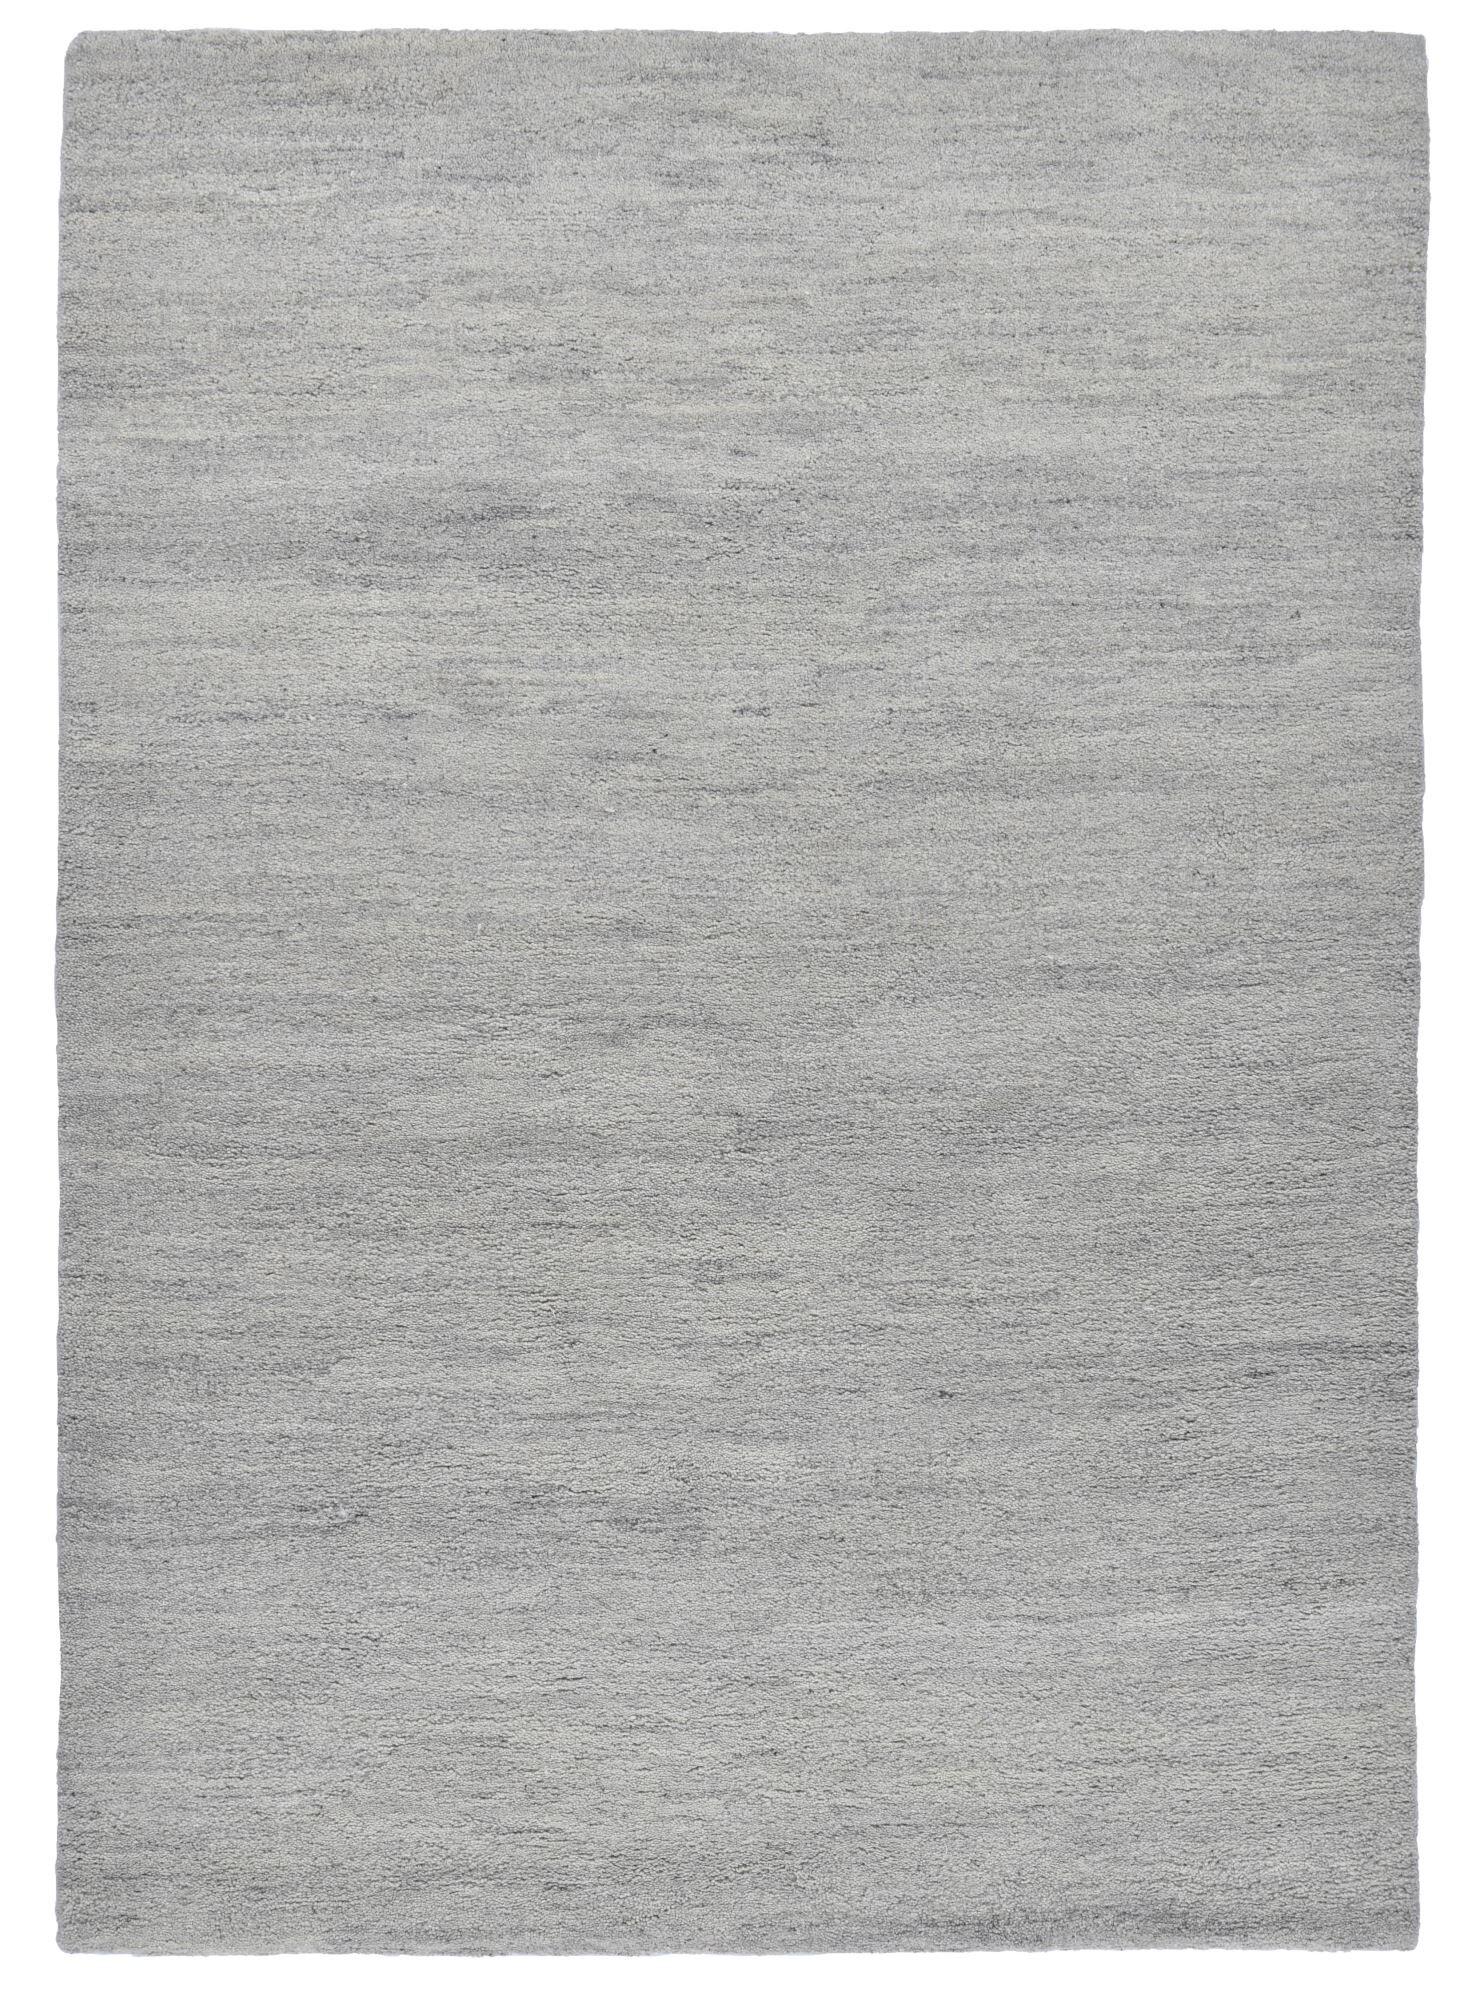 THEKO Tapis berber du maroc en laine naturelle gris 90x160